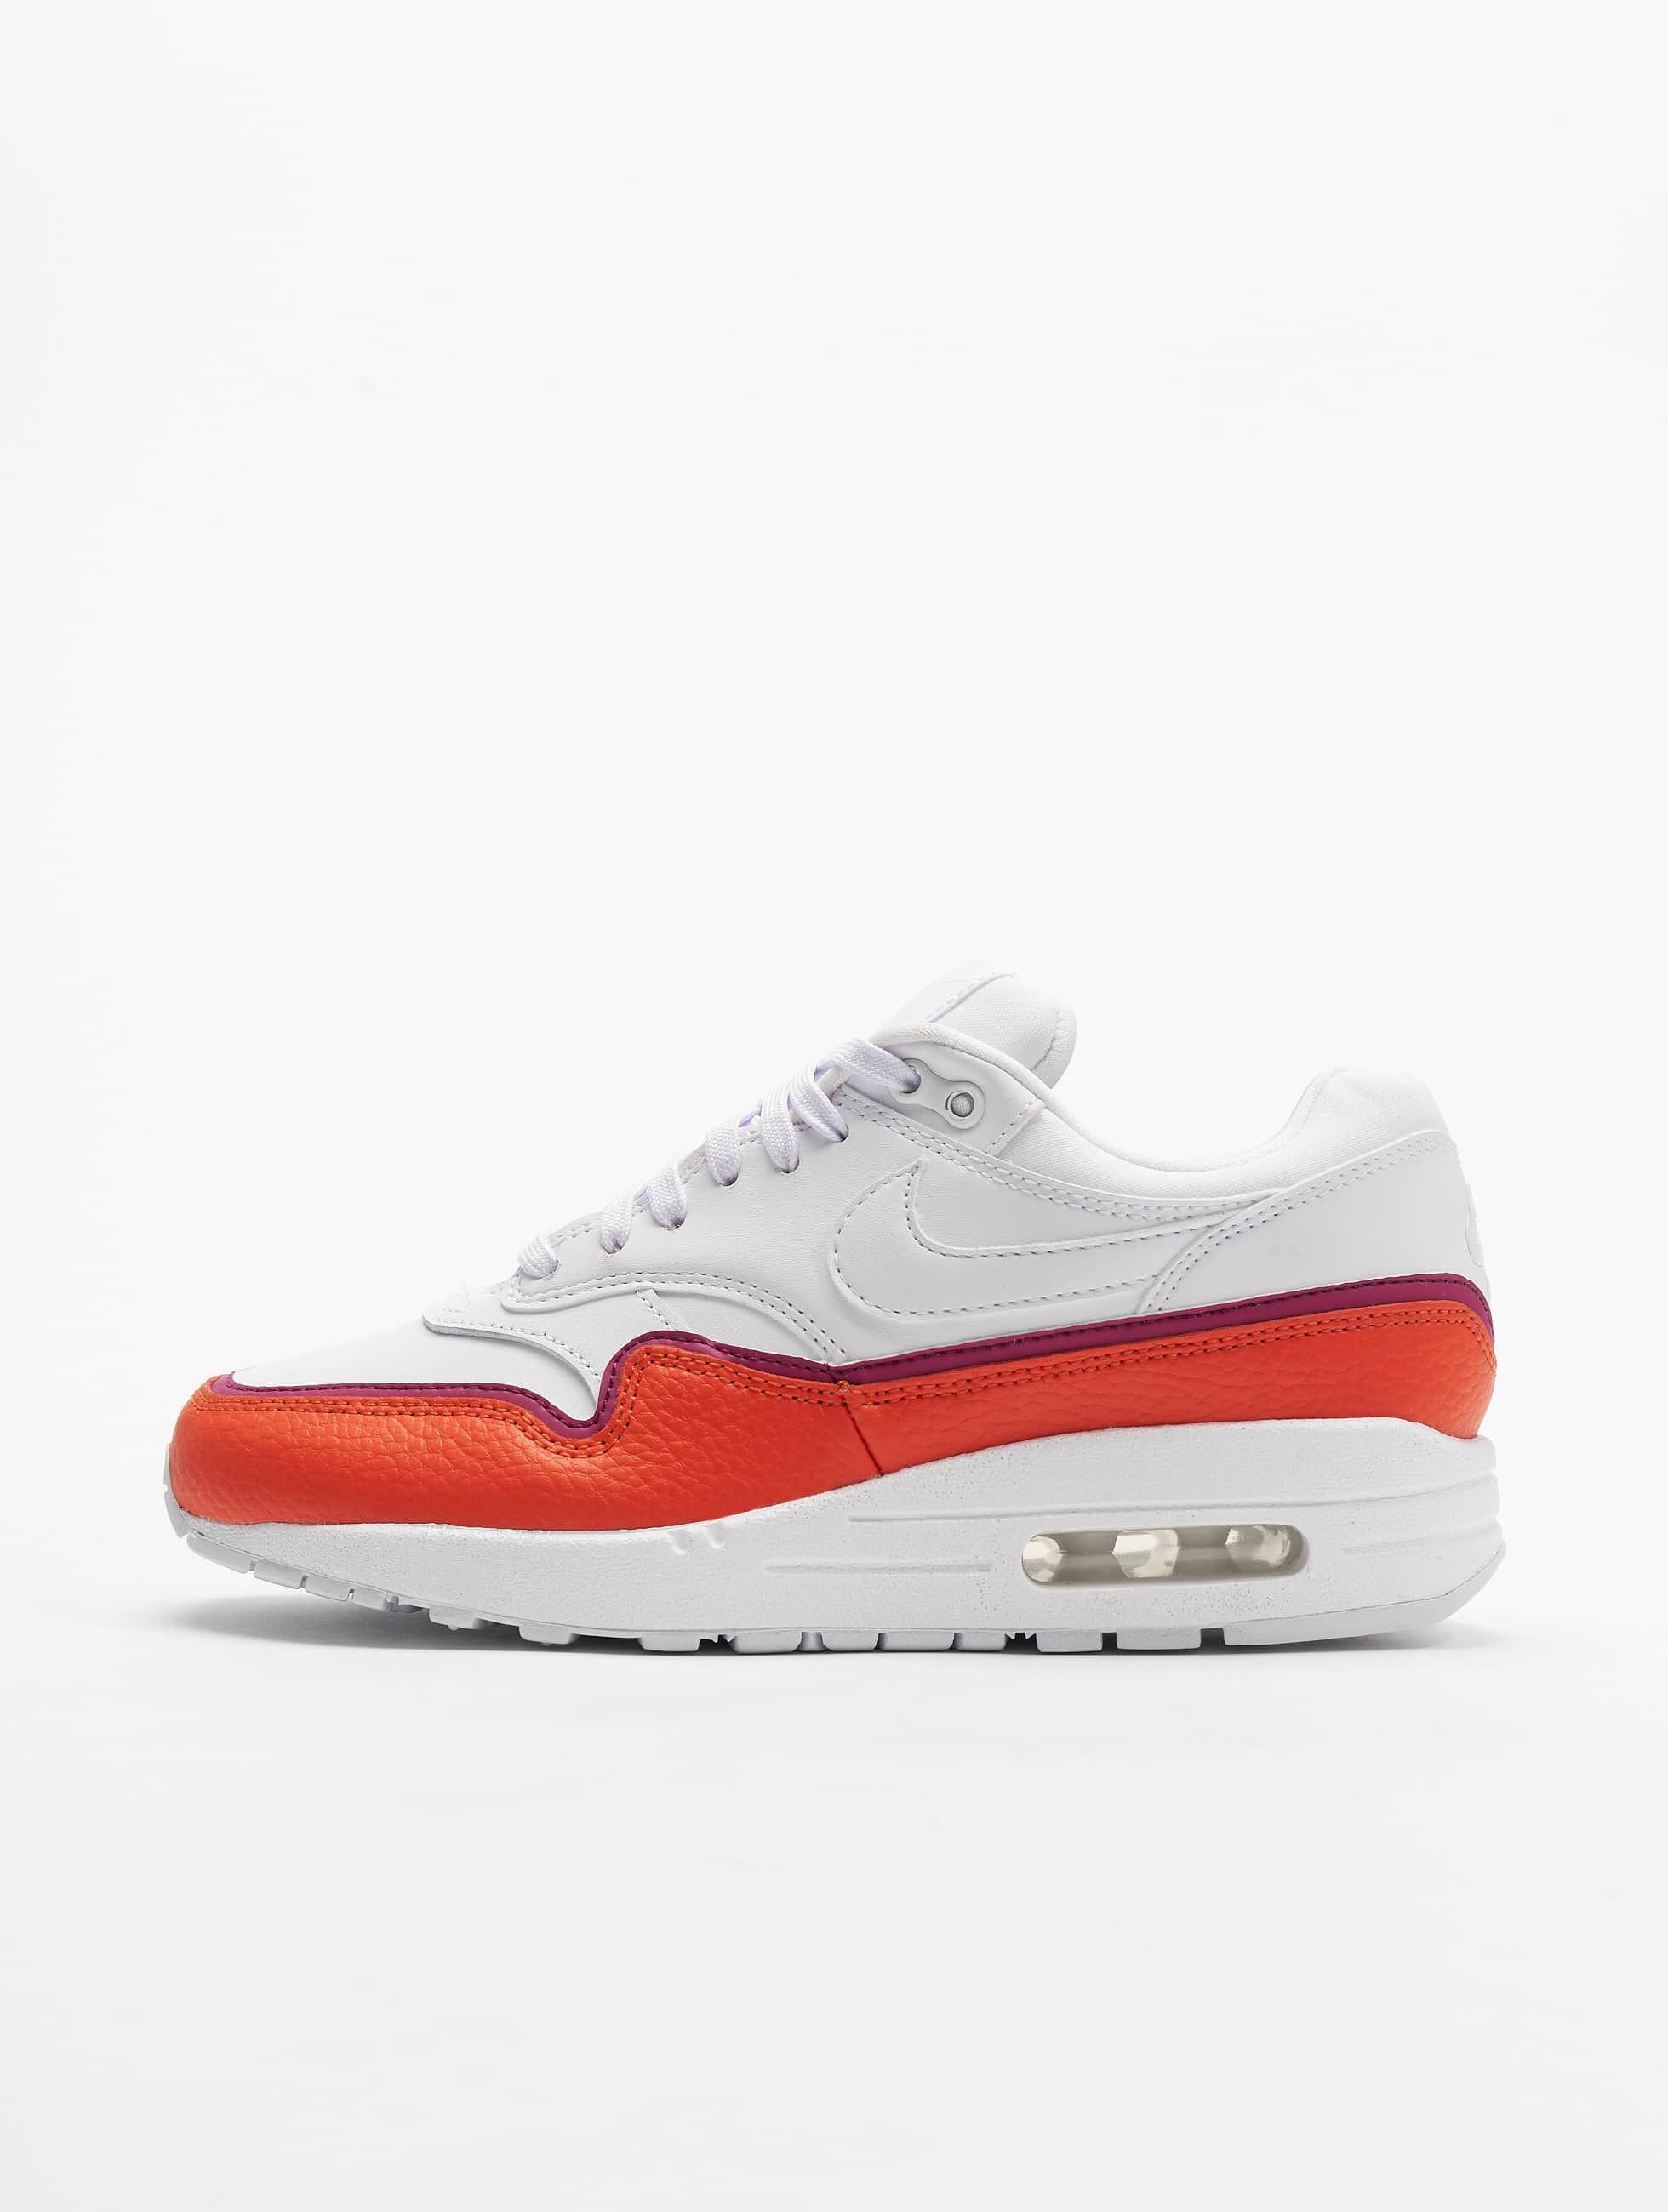 Sneakers Orangetrue Nike Max Berry 1 Air Se Whitewhiteteam DH92IWEYe